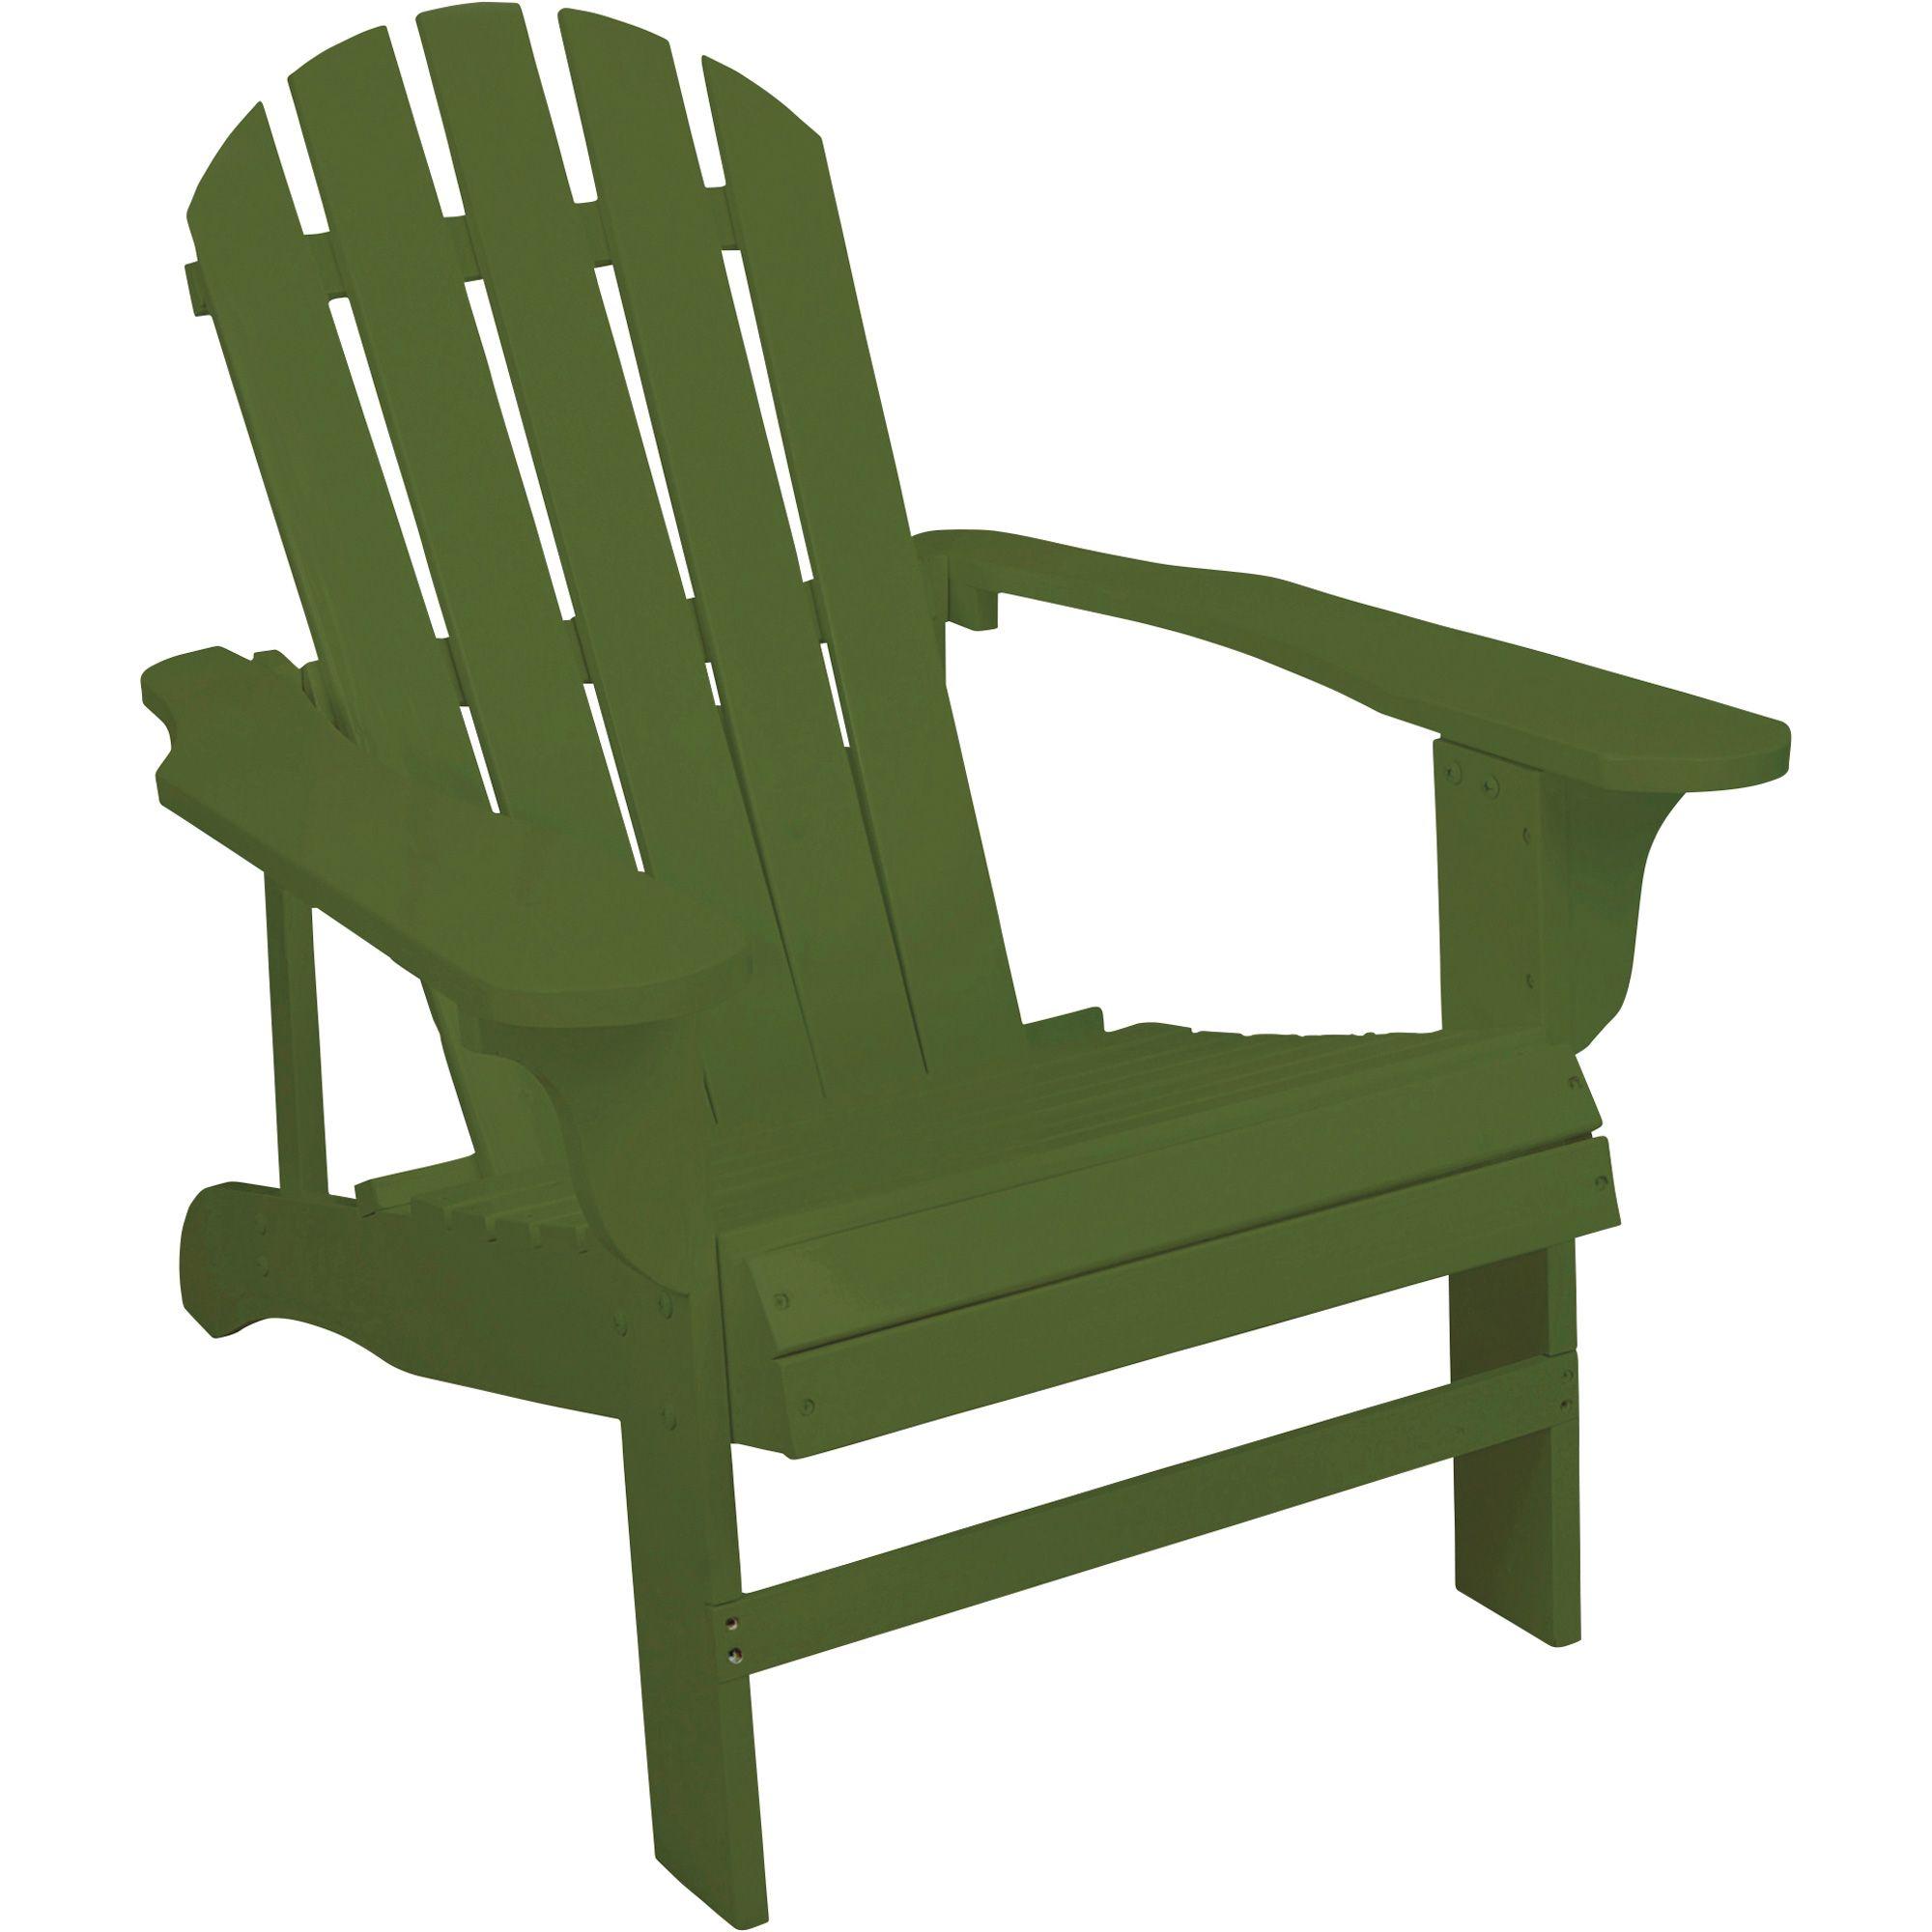 Classic sage painted wood adirondack chair model wood